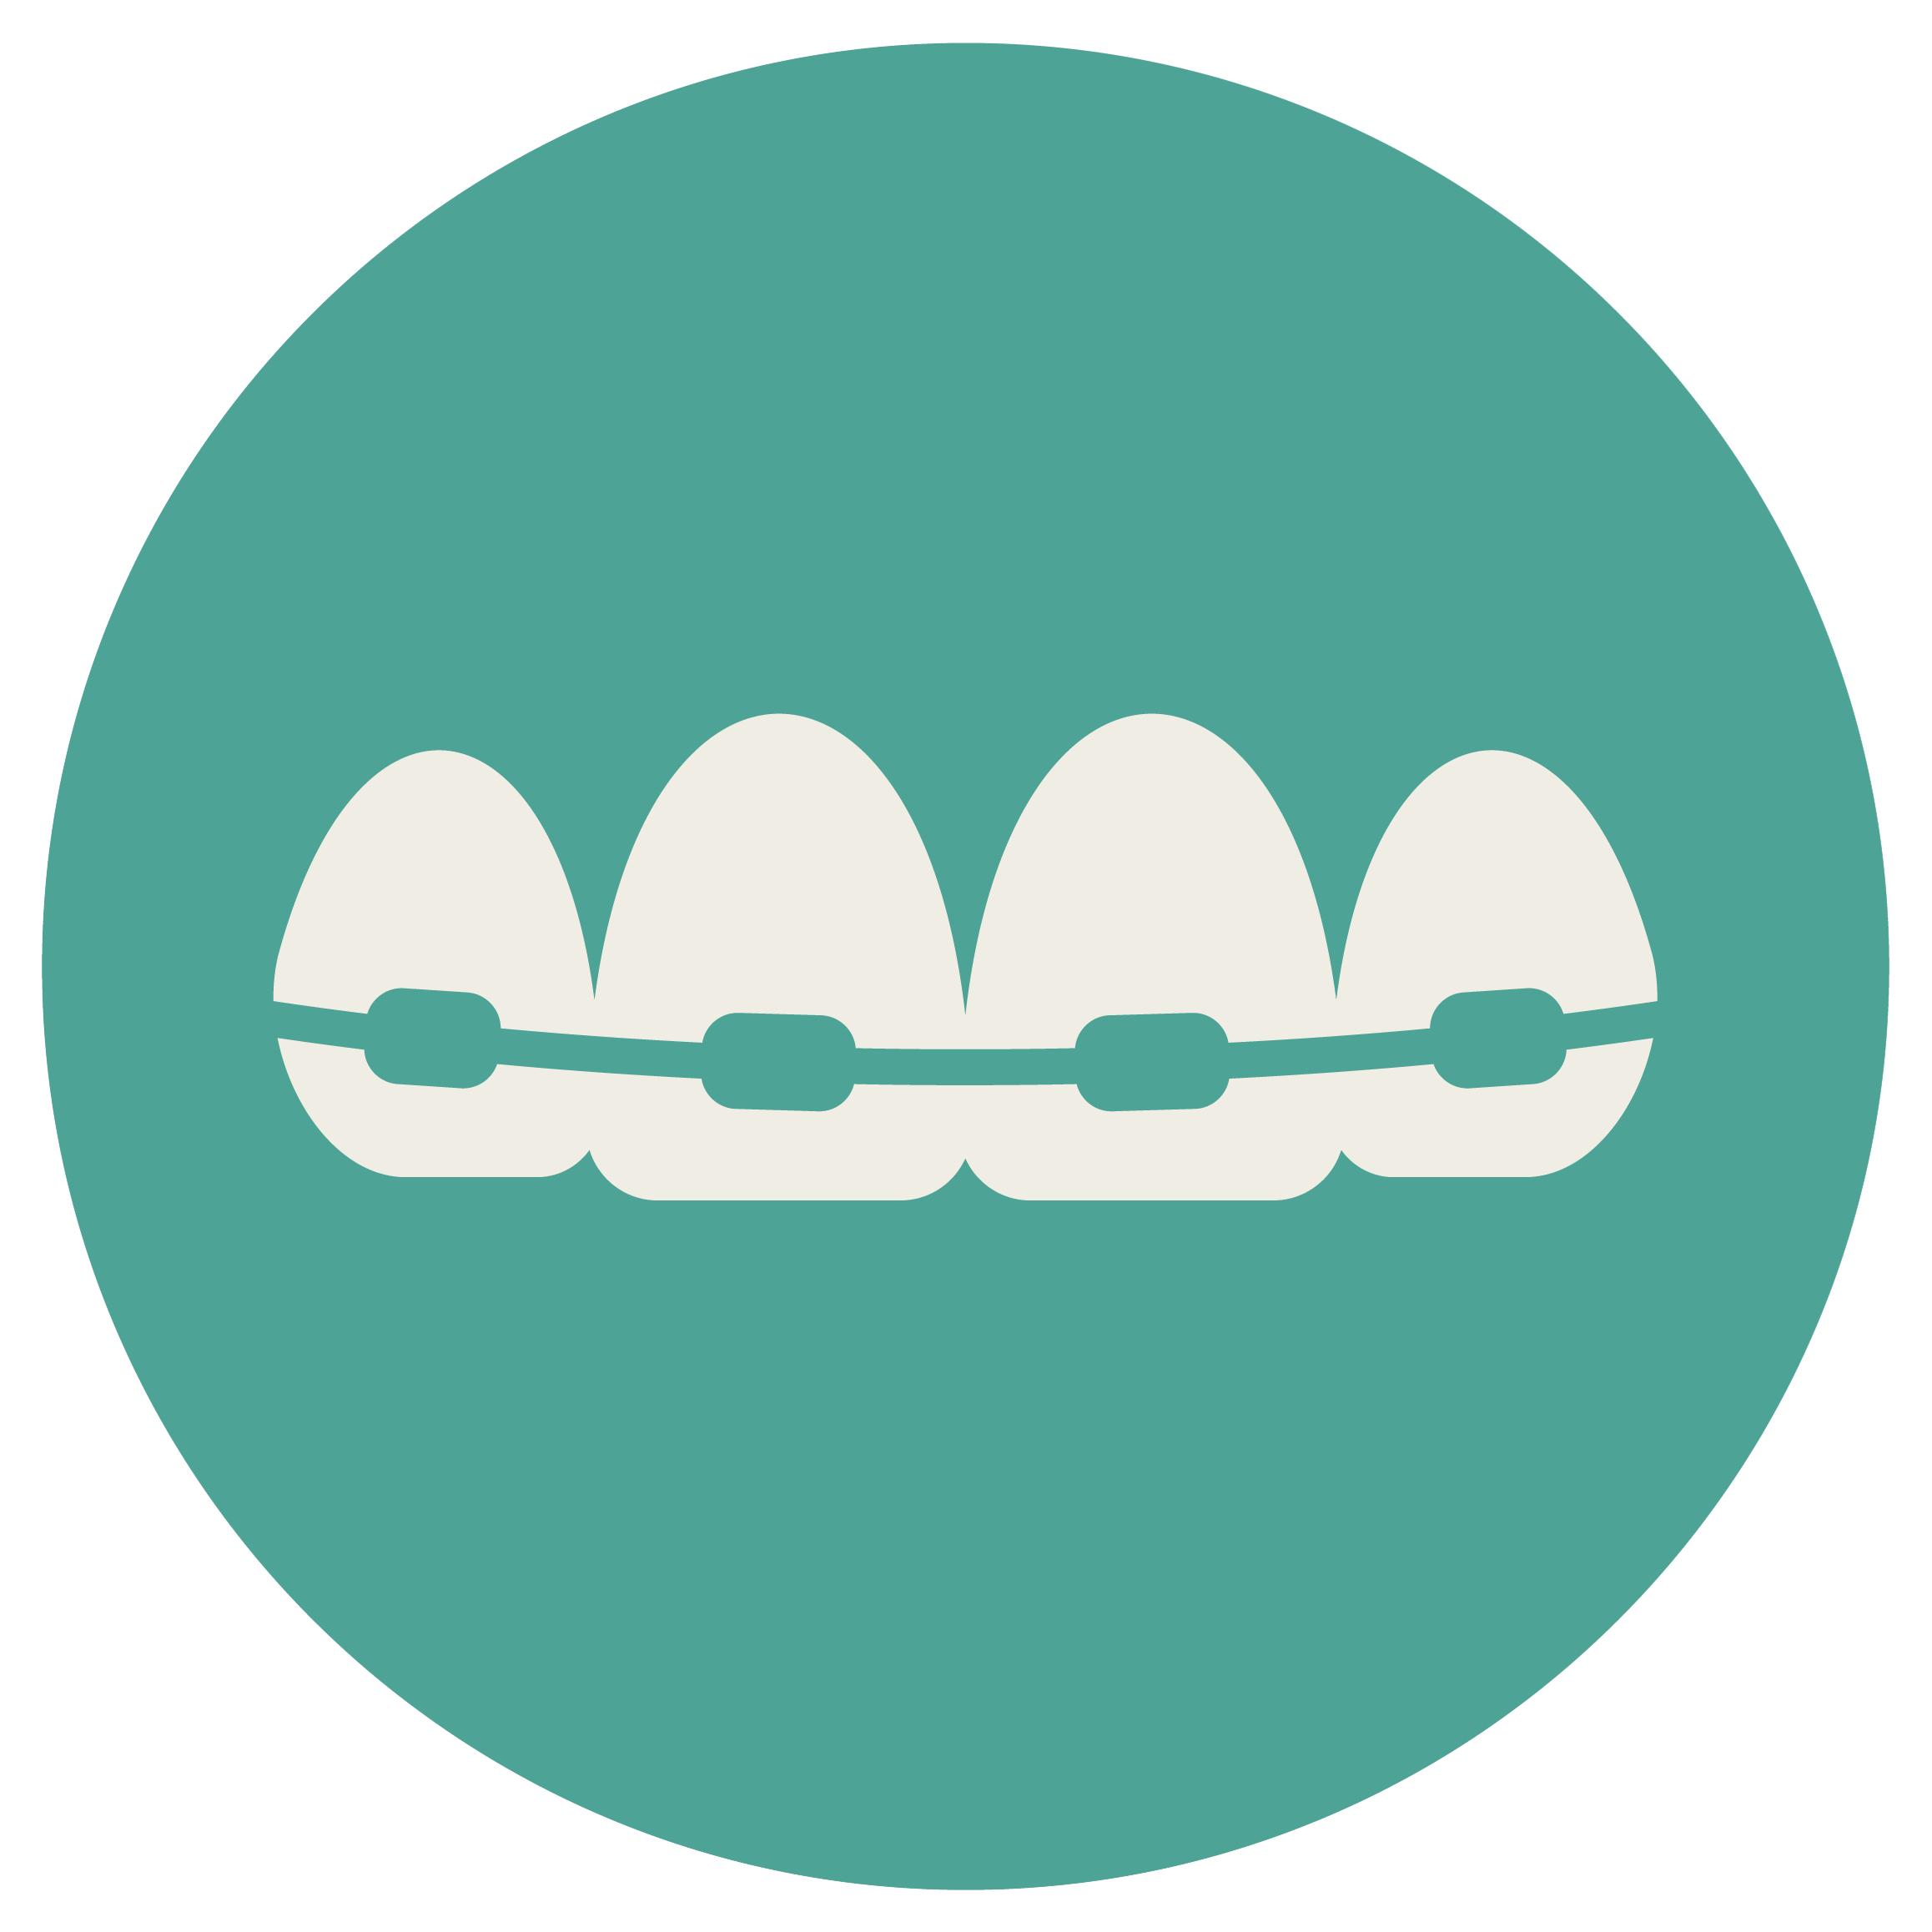 orthodontics-dentistry-crestwood-dental-clarkston-michigan-dentist-friendly-h